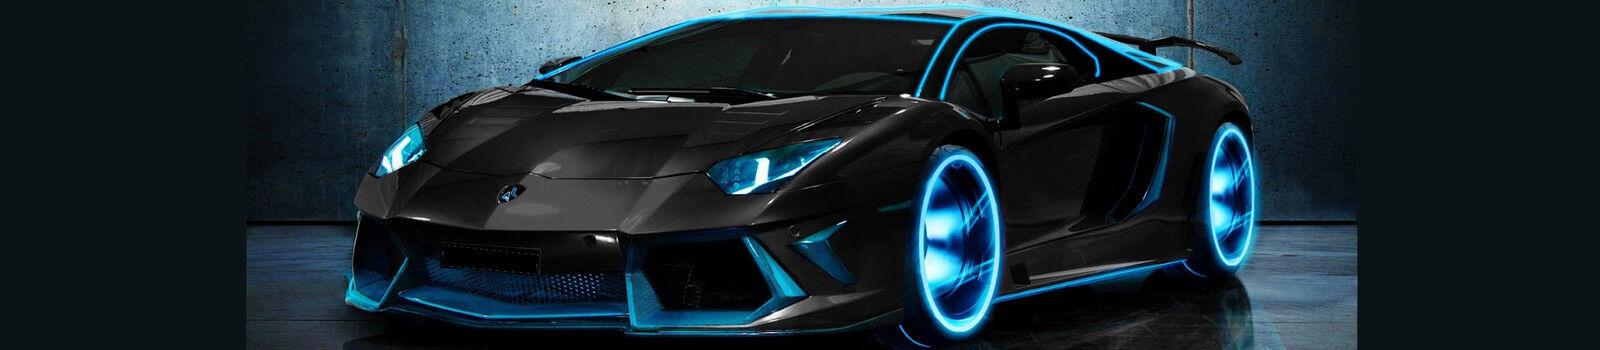 LED AUTOLUX